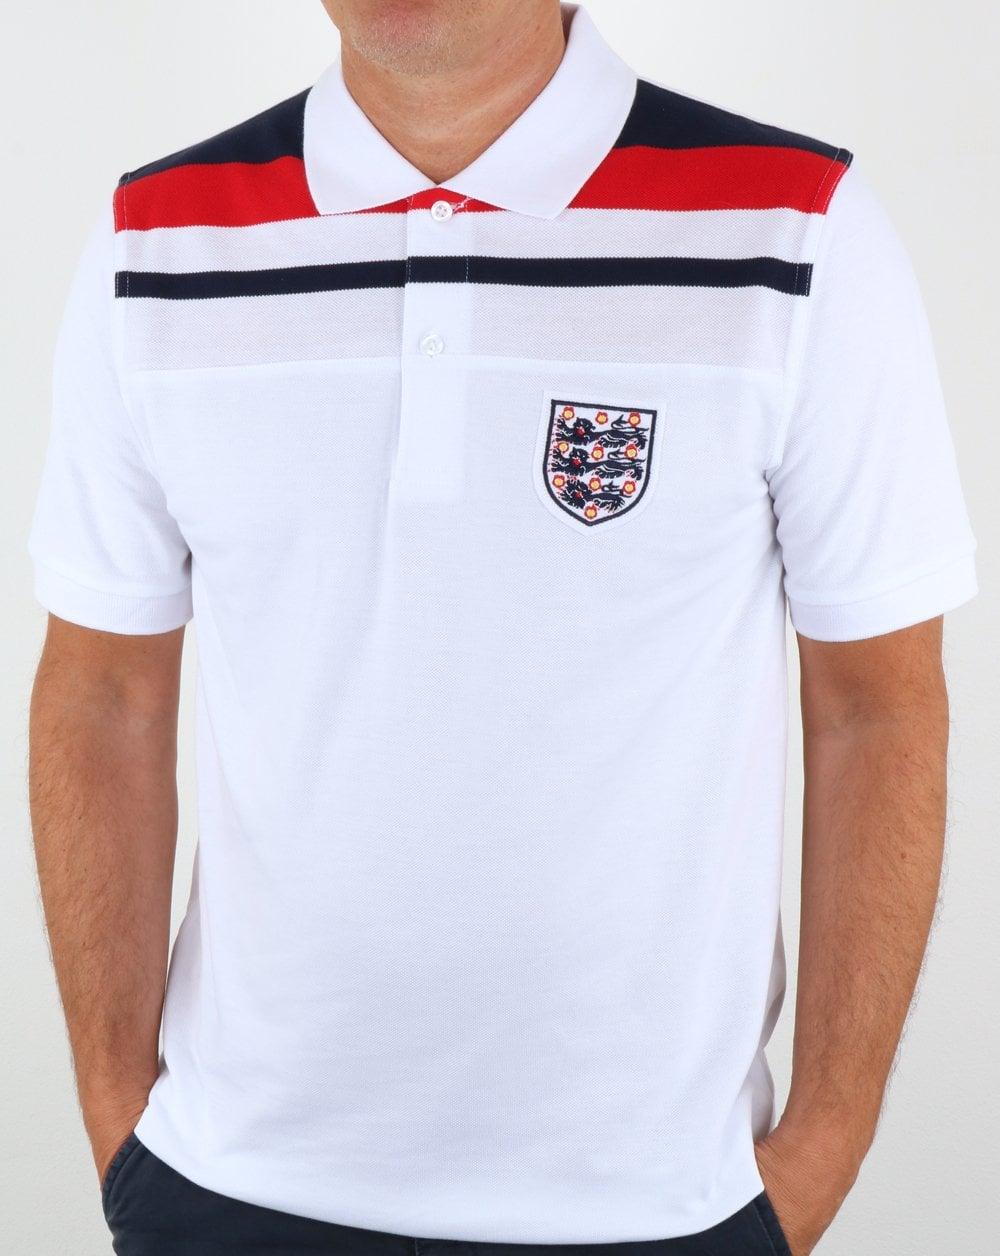 39376df3c 80s Casual Classics 80s Casual Classics England 1982 Polo Shirt White